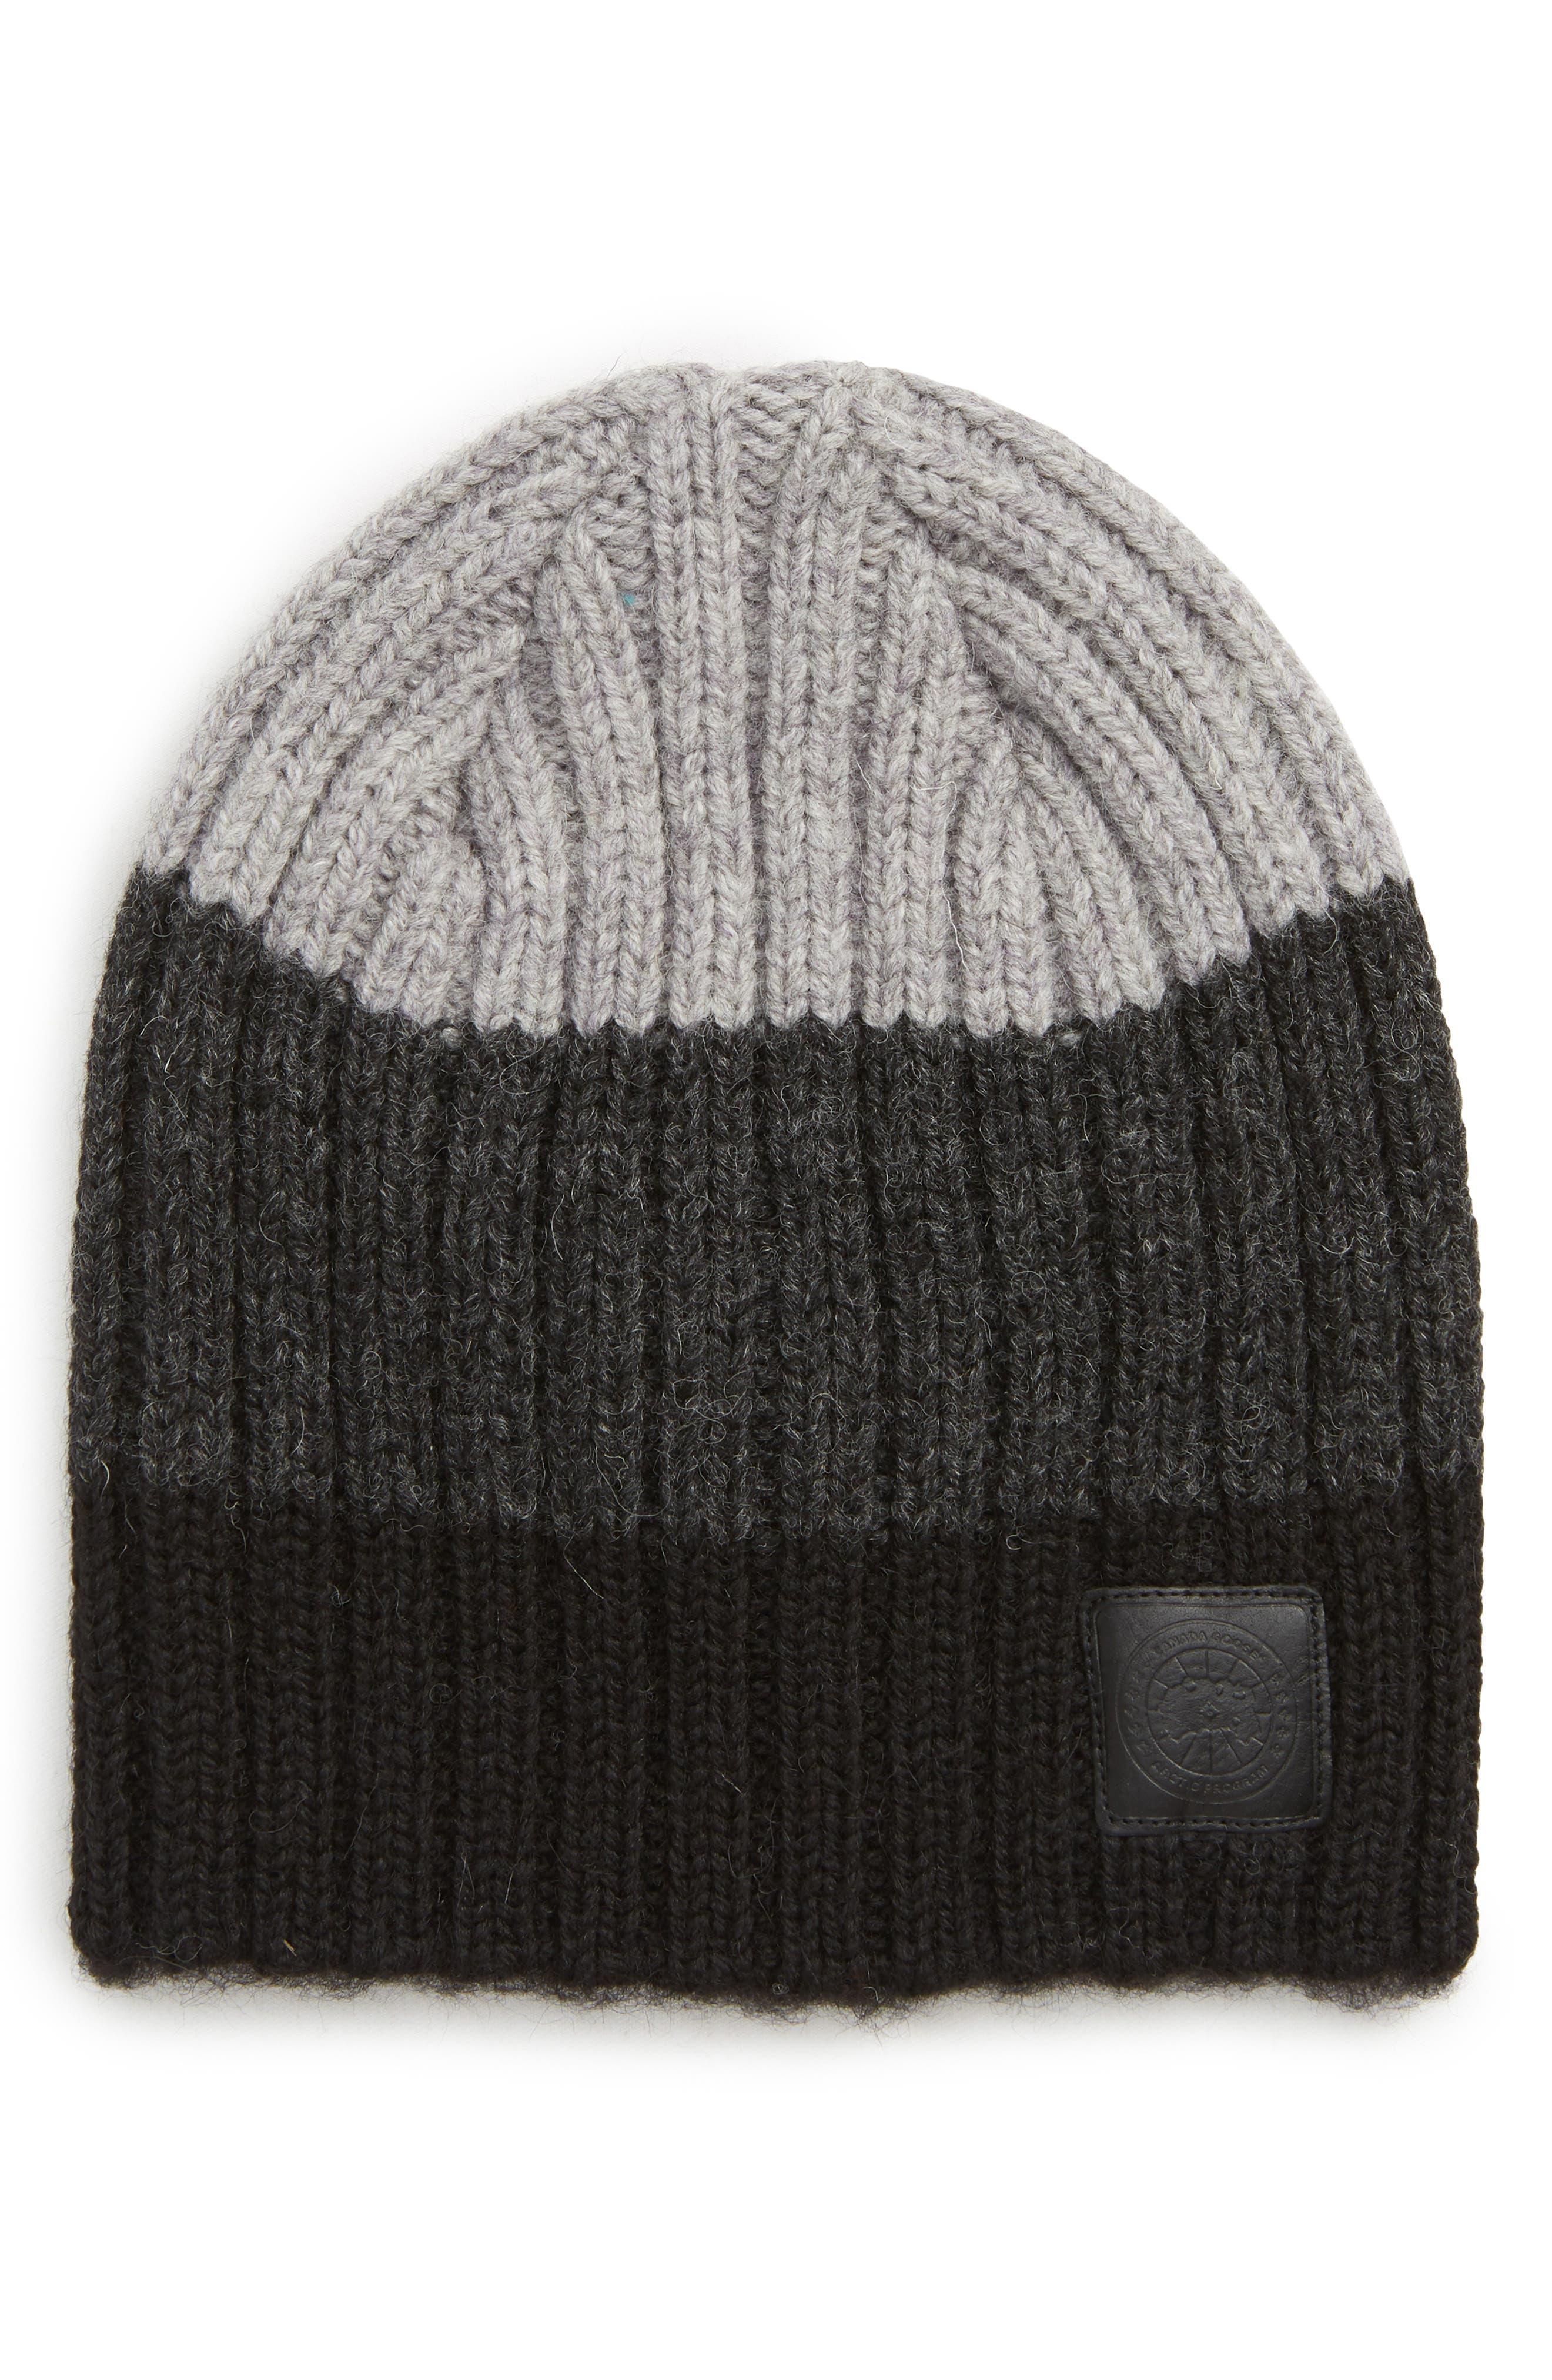 a4c4f5e087d Men s Blue Beanies  Knit Caps   Winter Hats